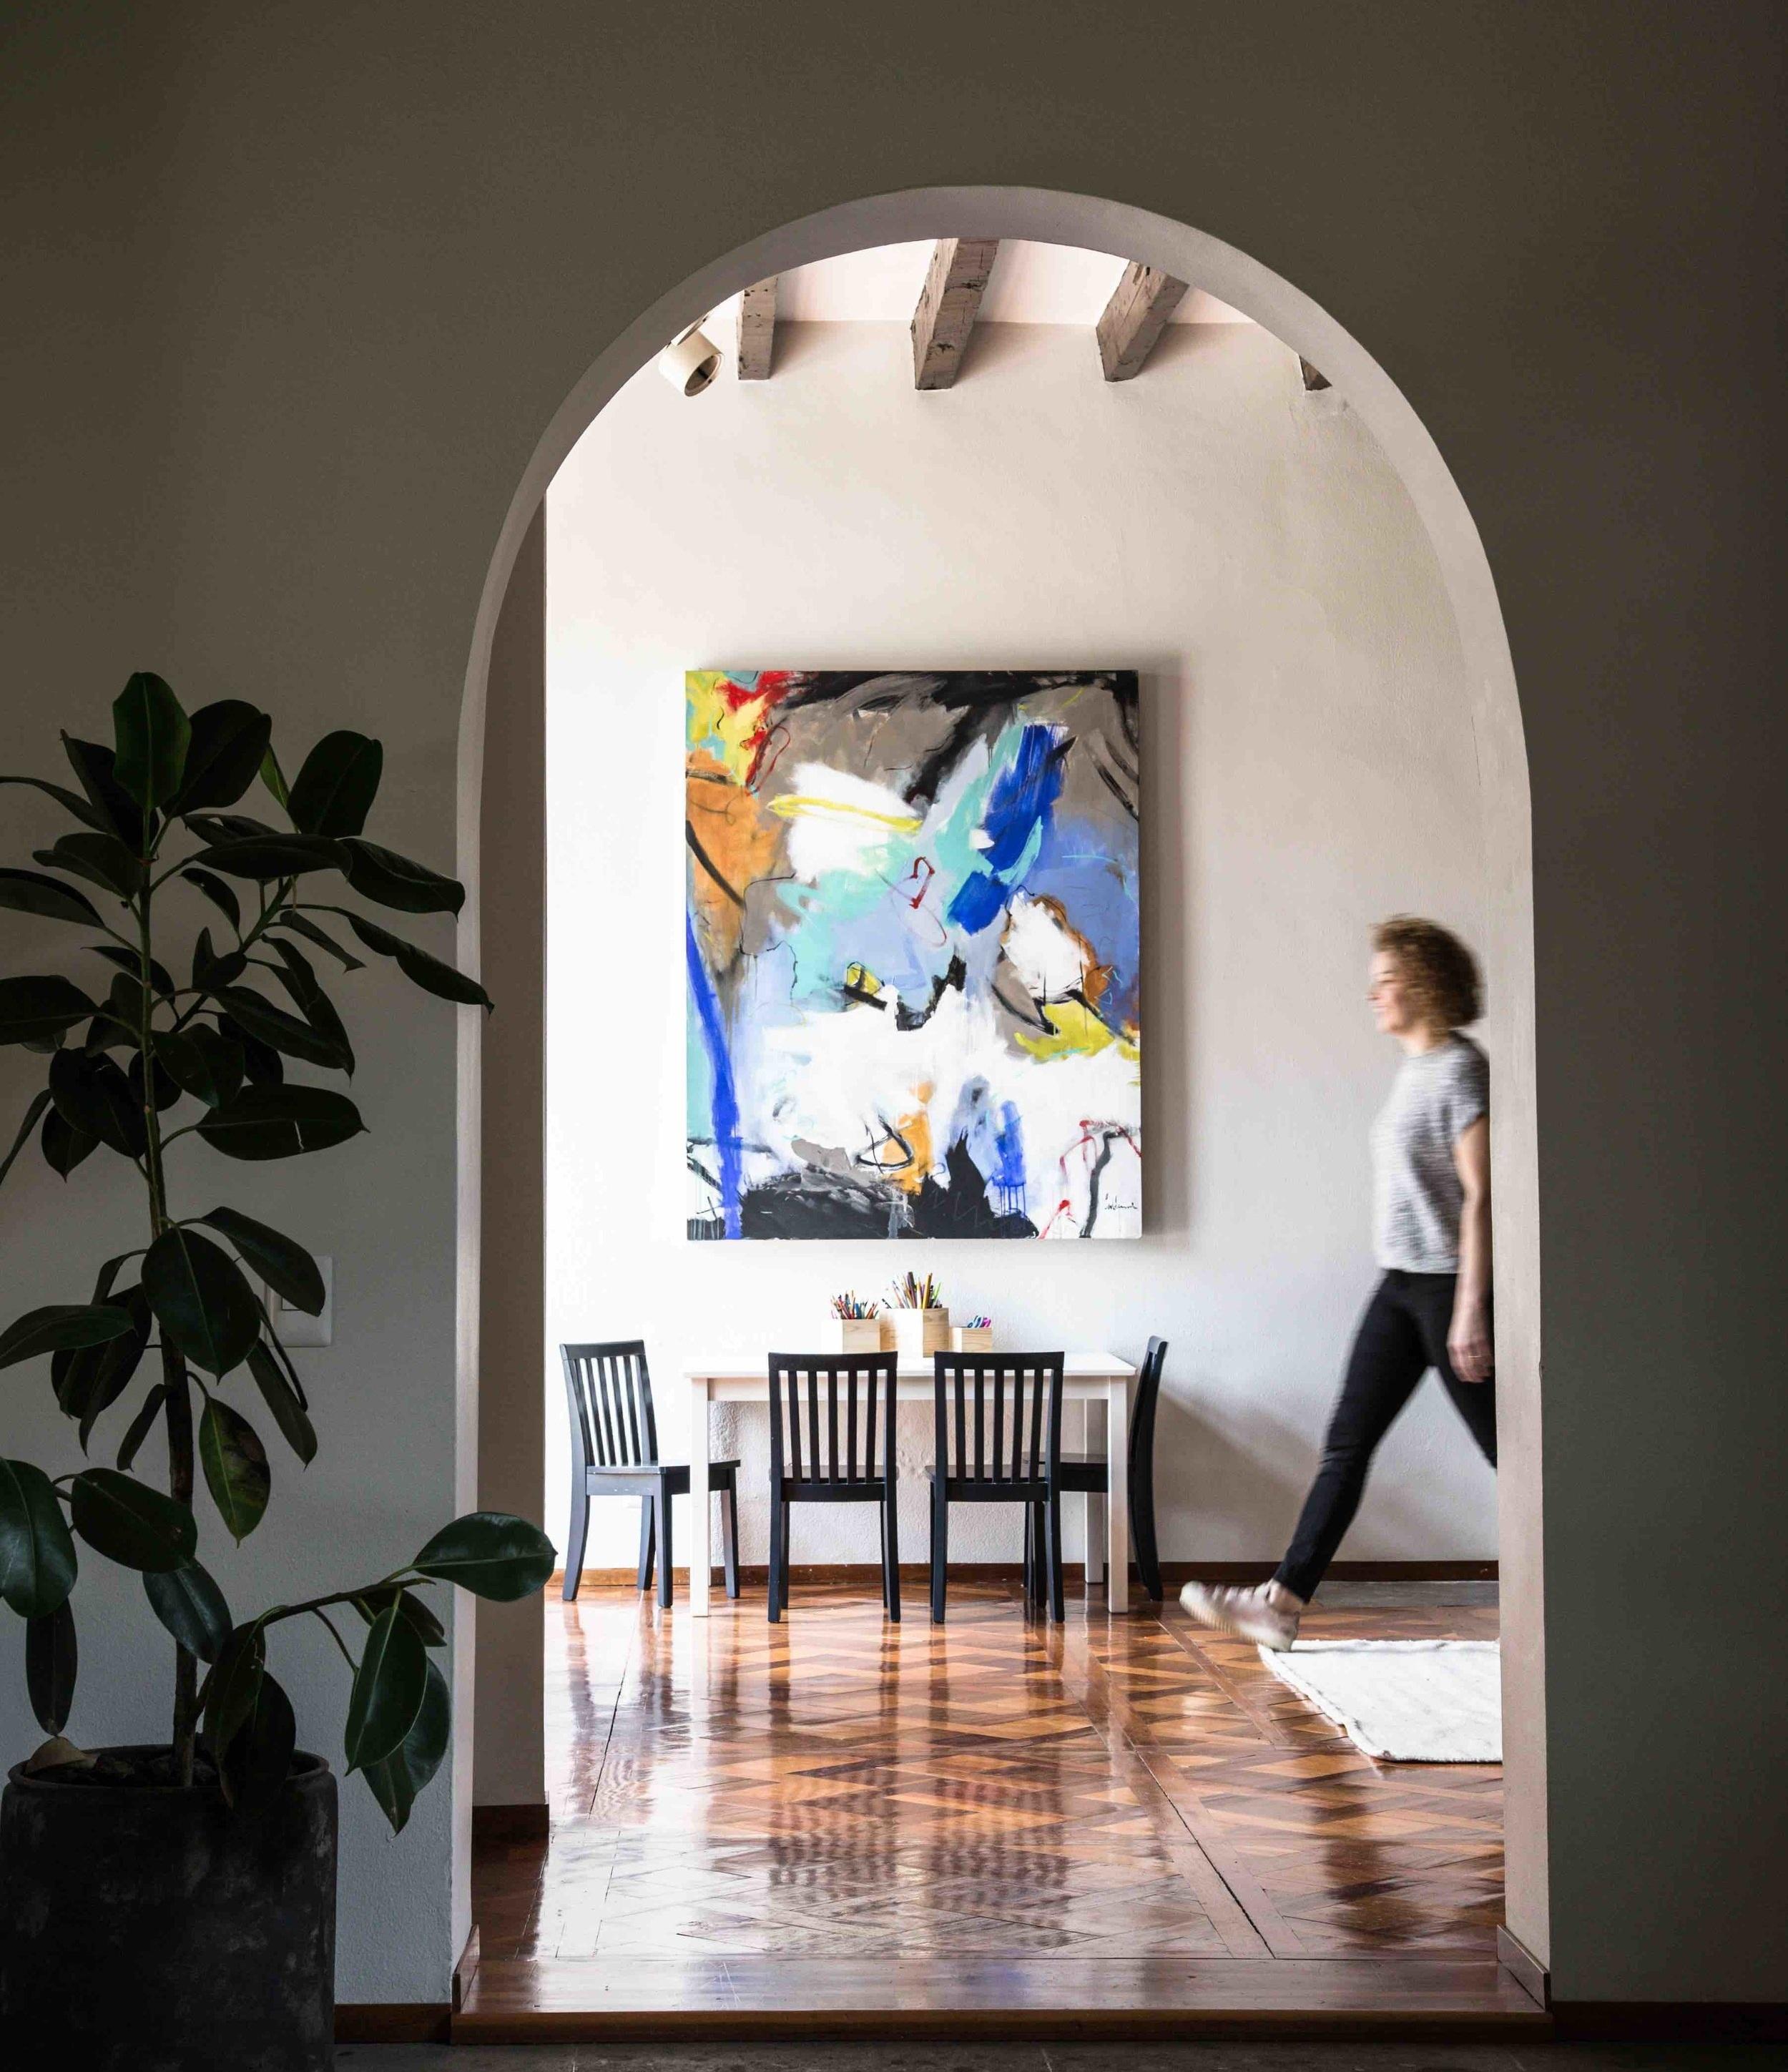 roberts_lamb_jana_robertson_interiors.jpg